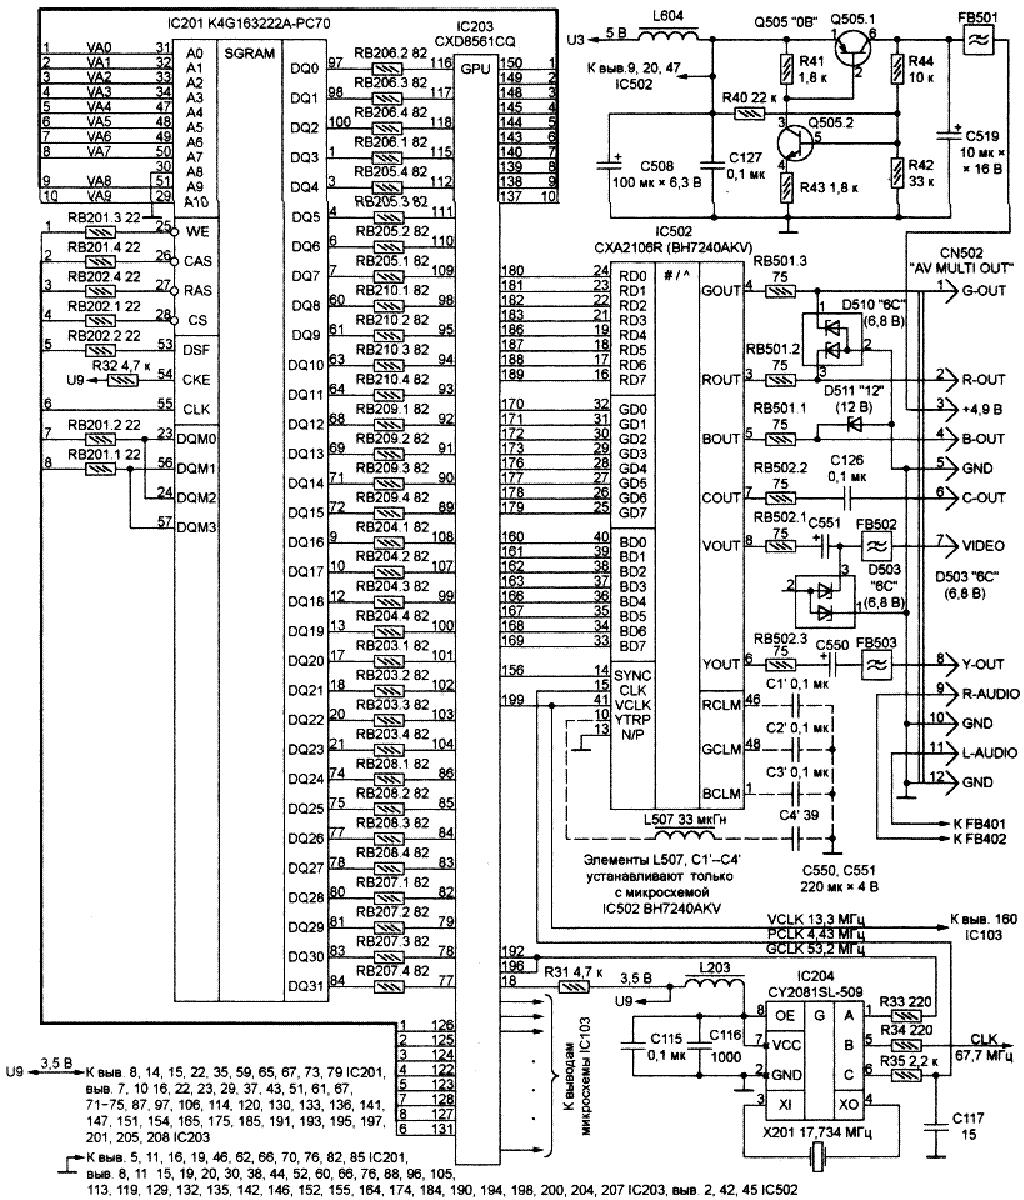 Sony playstation one схема